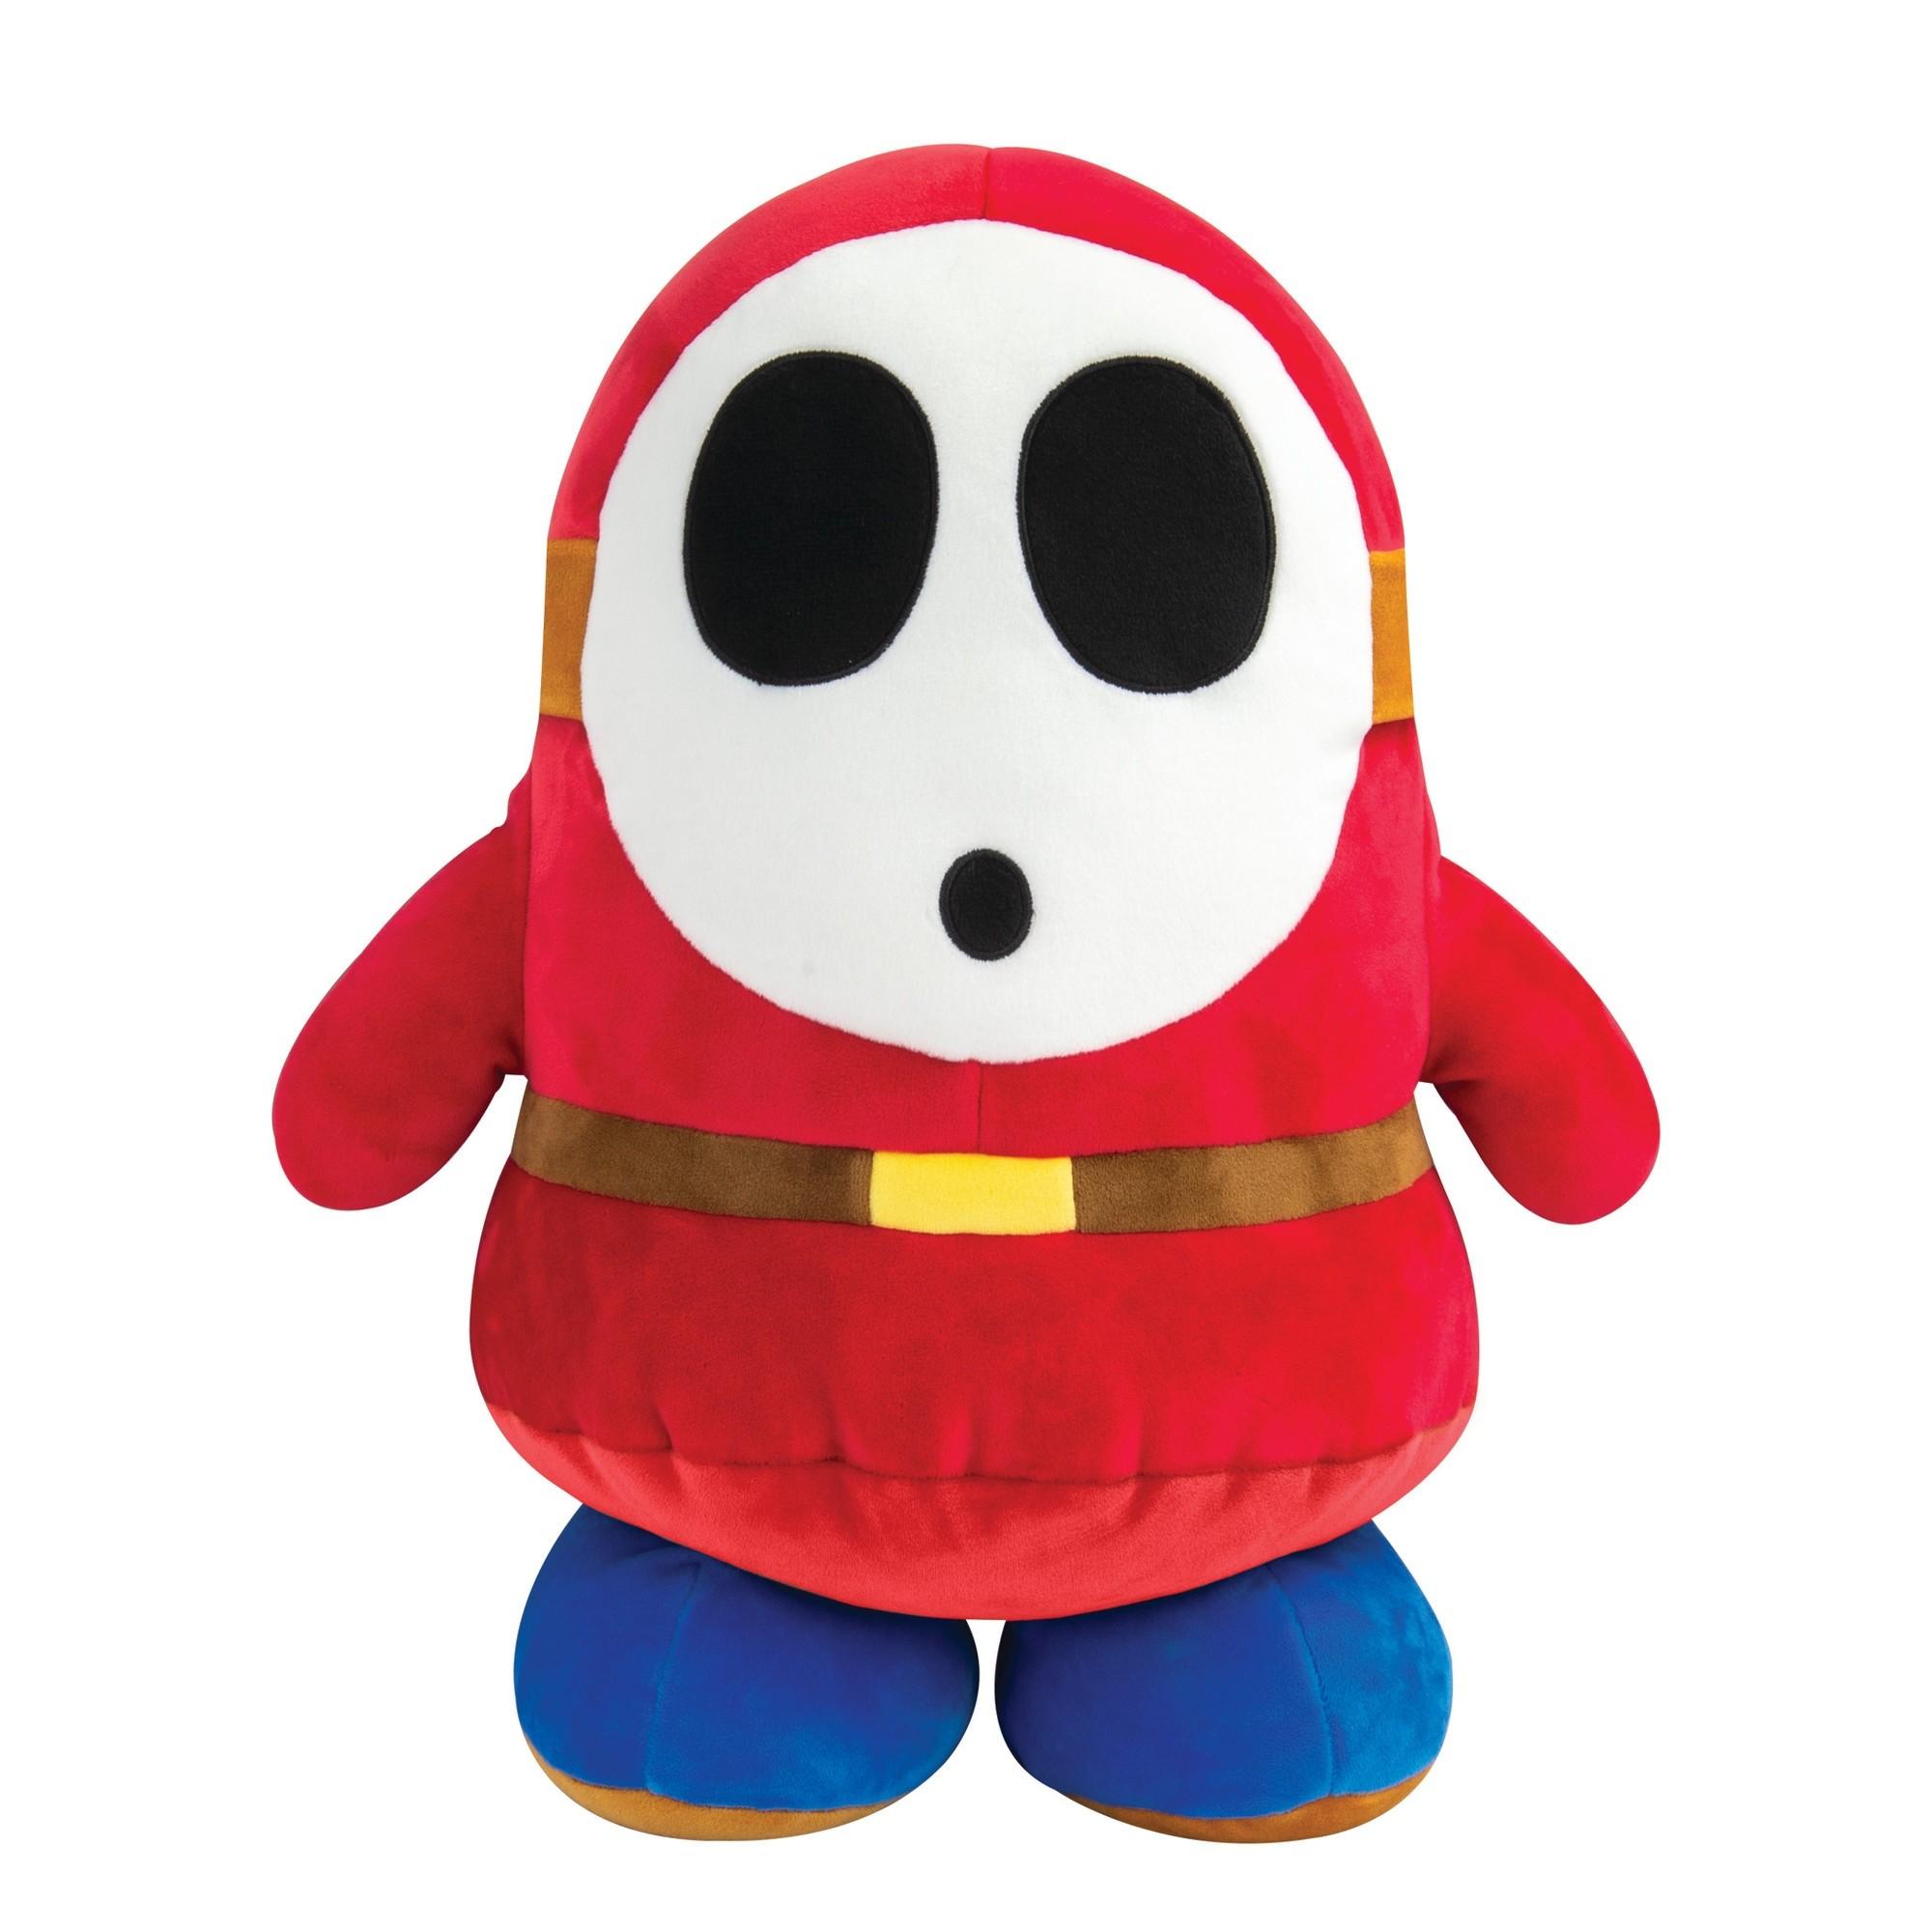 Mocchi-Mocchi Super Mario Bros Shy Guy Mega Plush